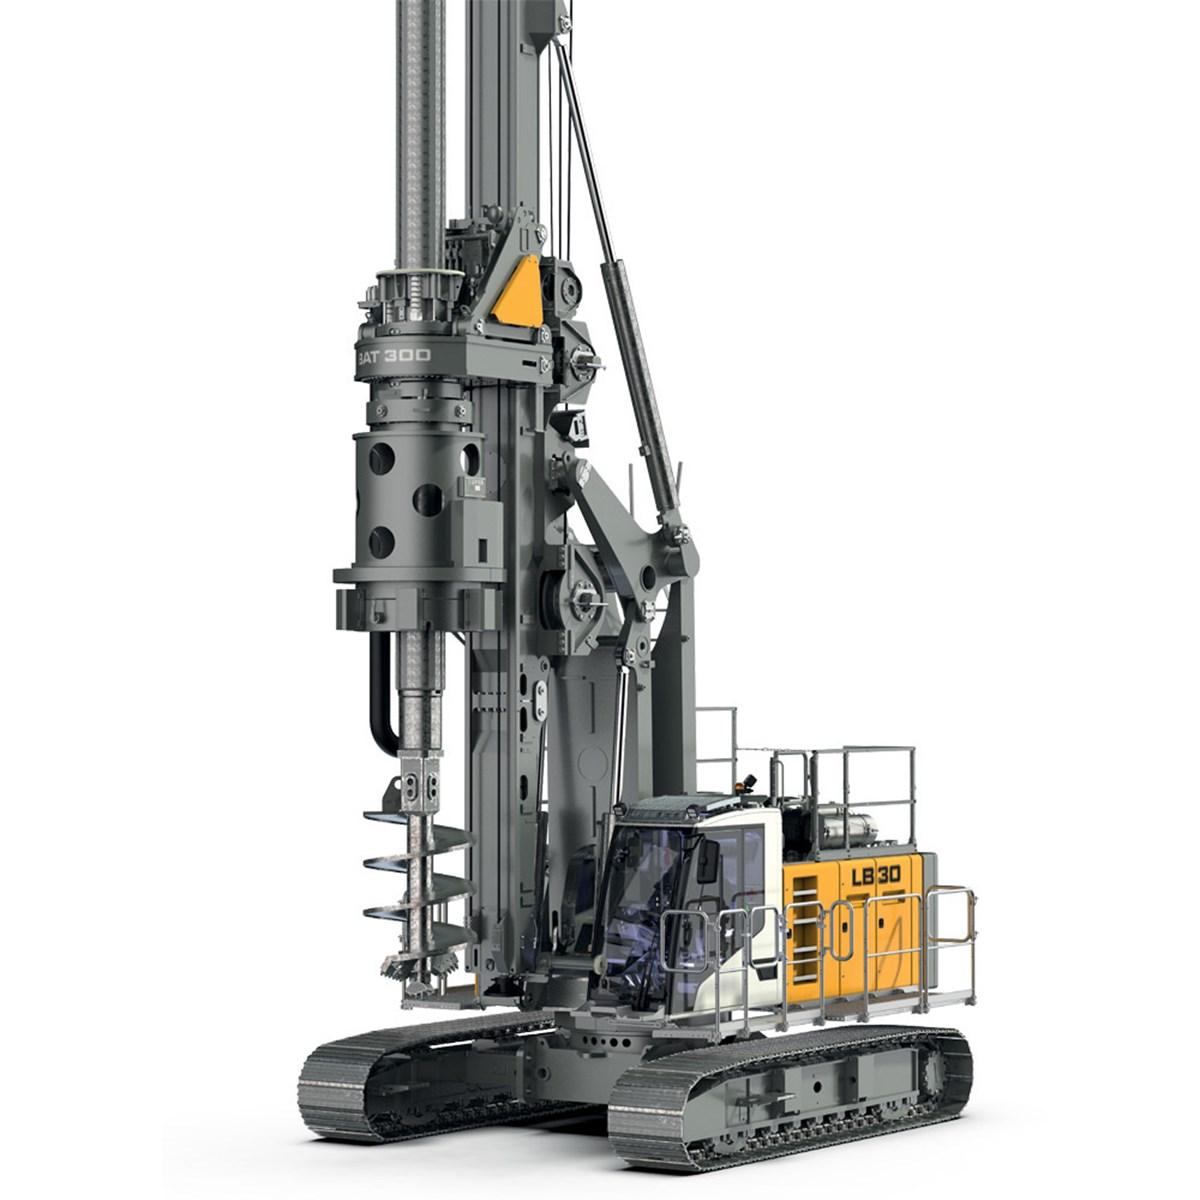 liebherr-lb-30-drilling-rig-drehbohrgerat-pic1-1.jpg